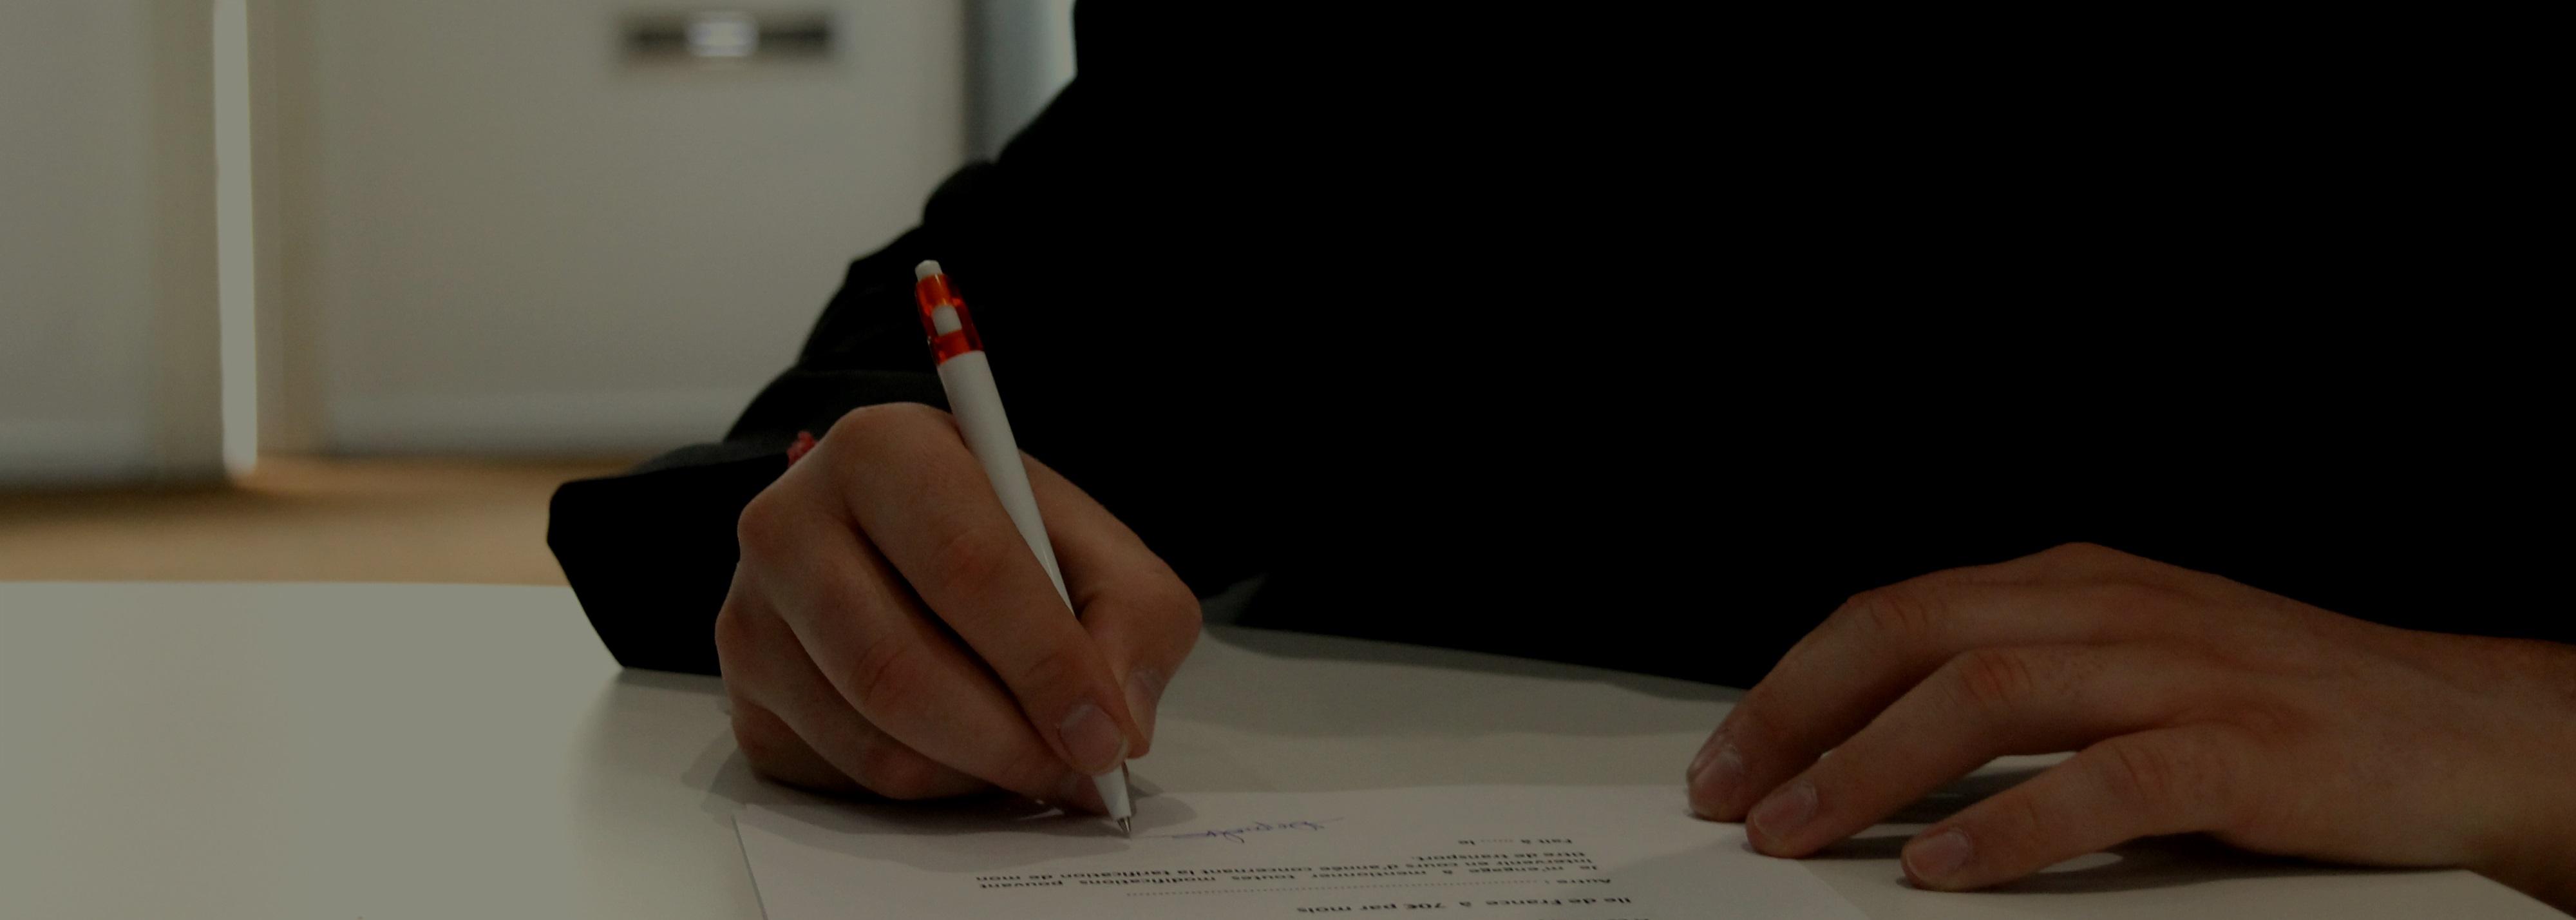 Signature-noir1